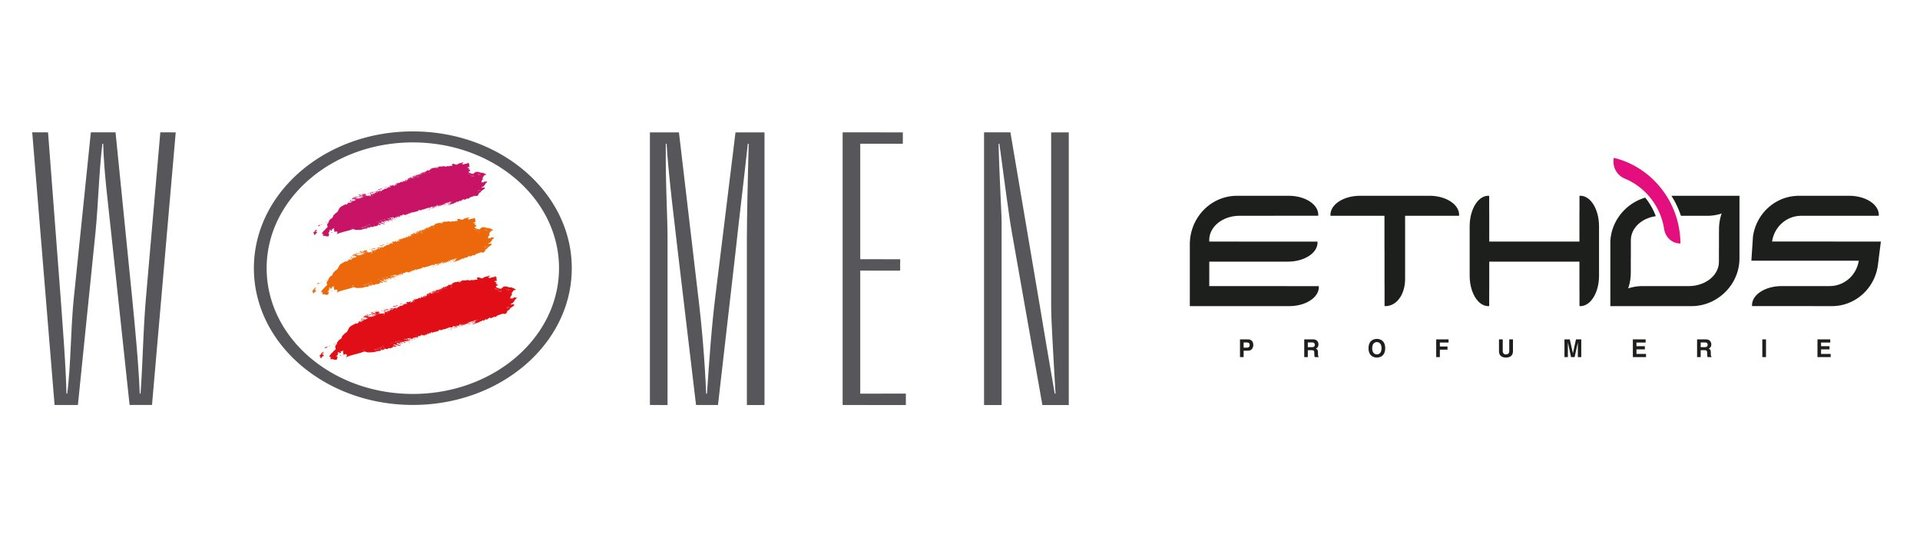 women ethos